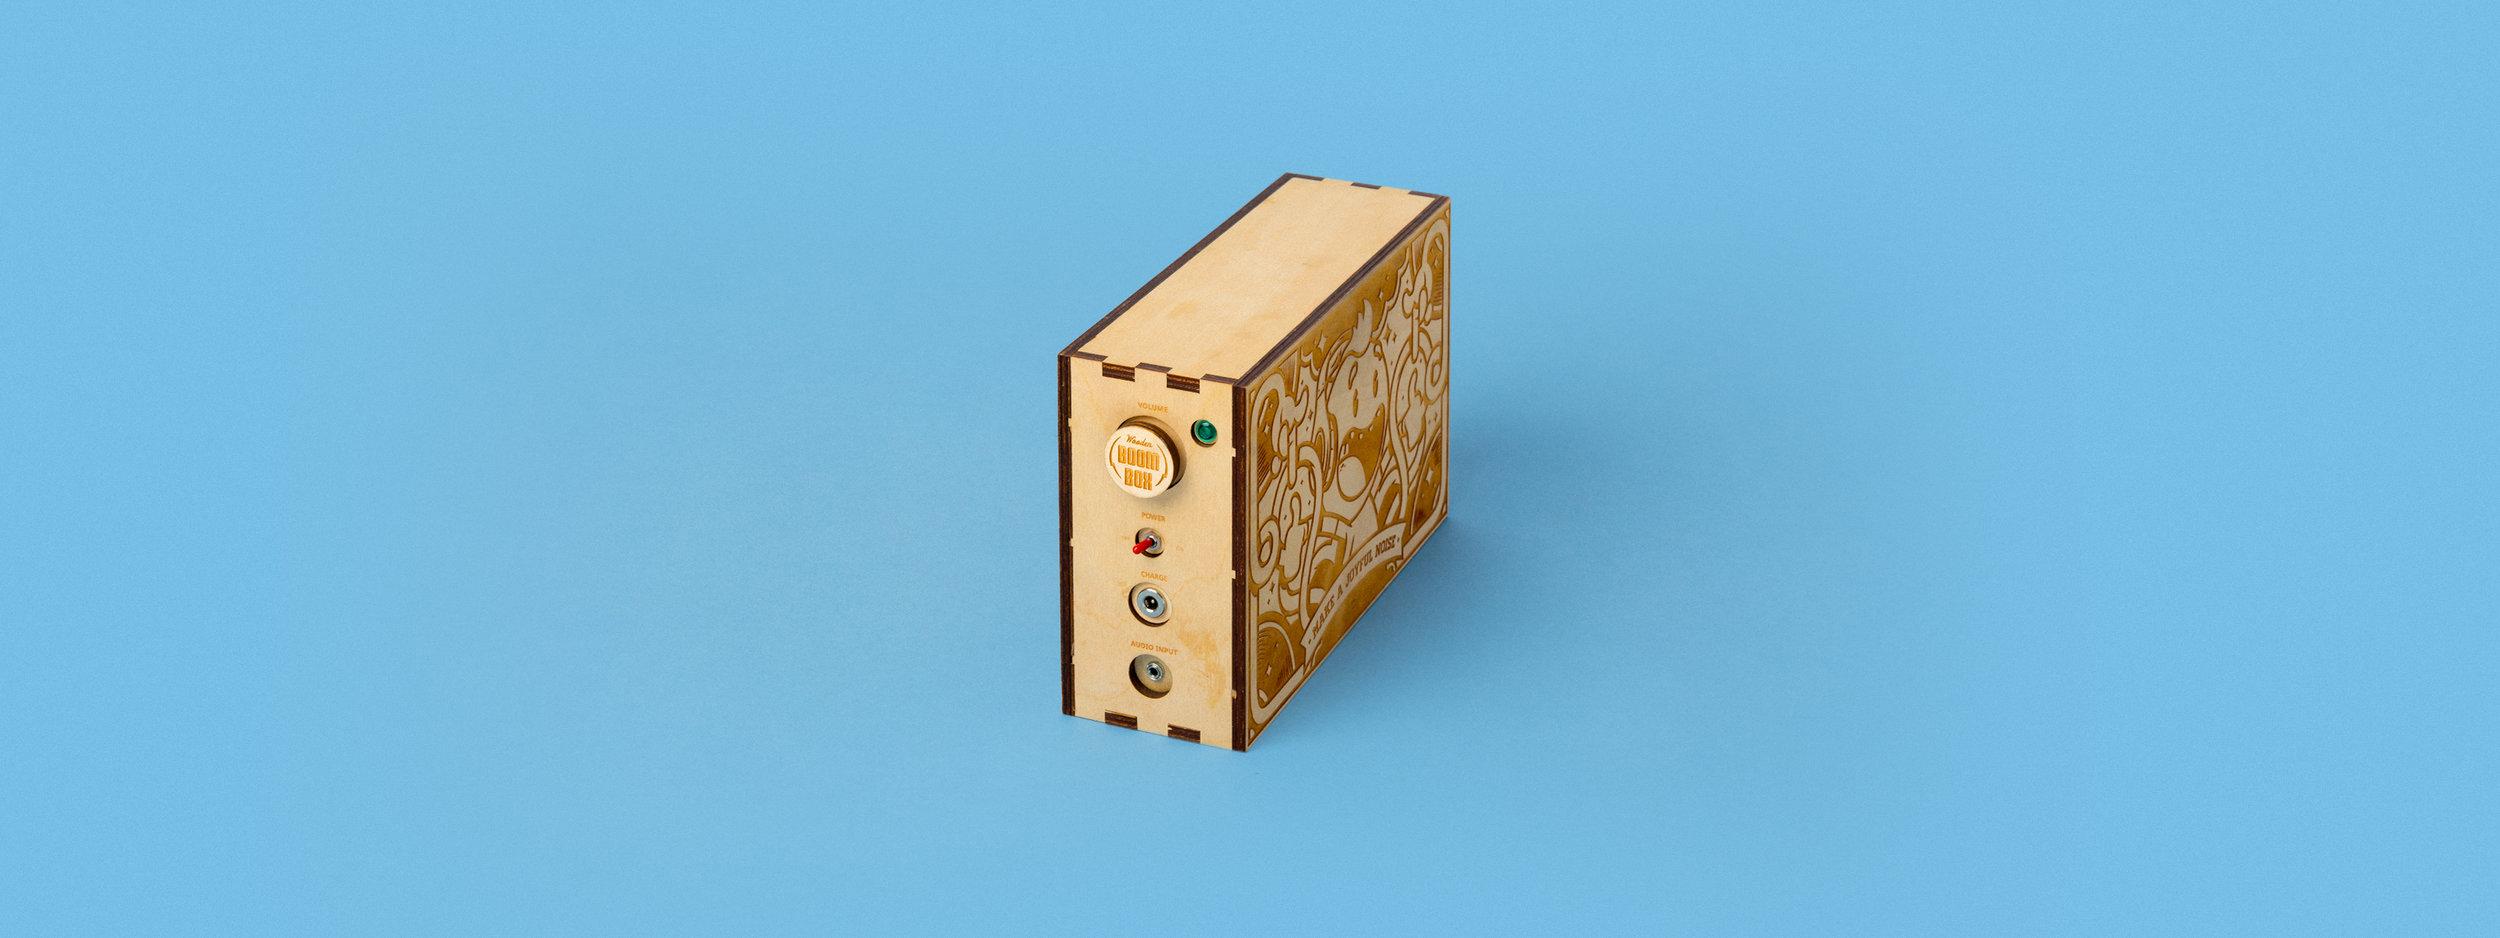 laser cut wood, laser cut box, boom box, finger joint, custom fabrication, portland, engraved artwork